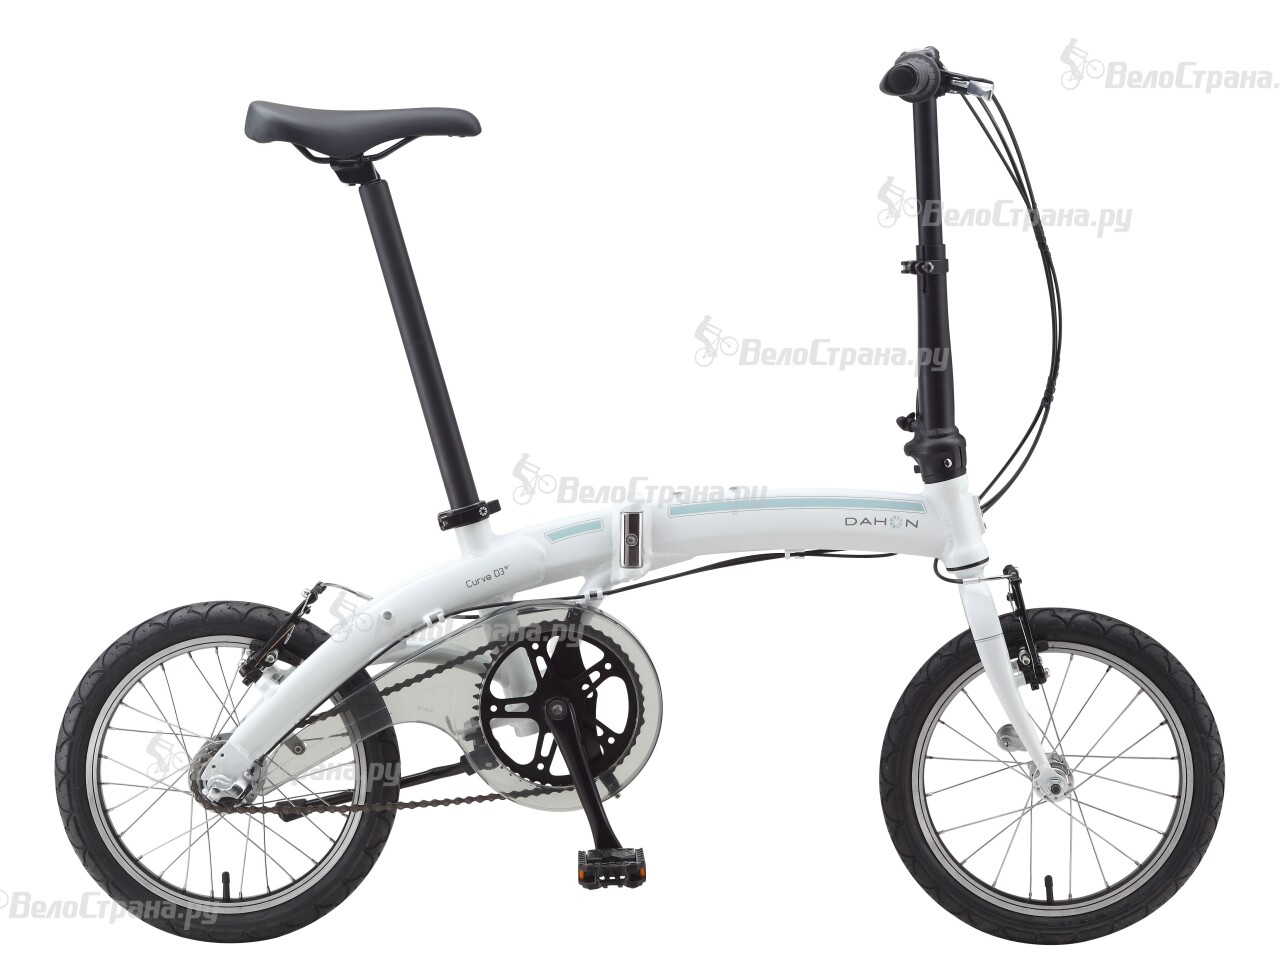 Велосипед Dahon Curve i3 16'' (2015)